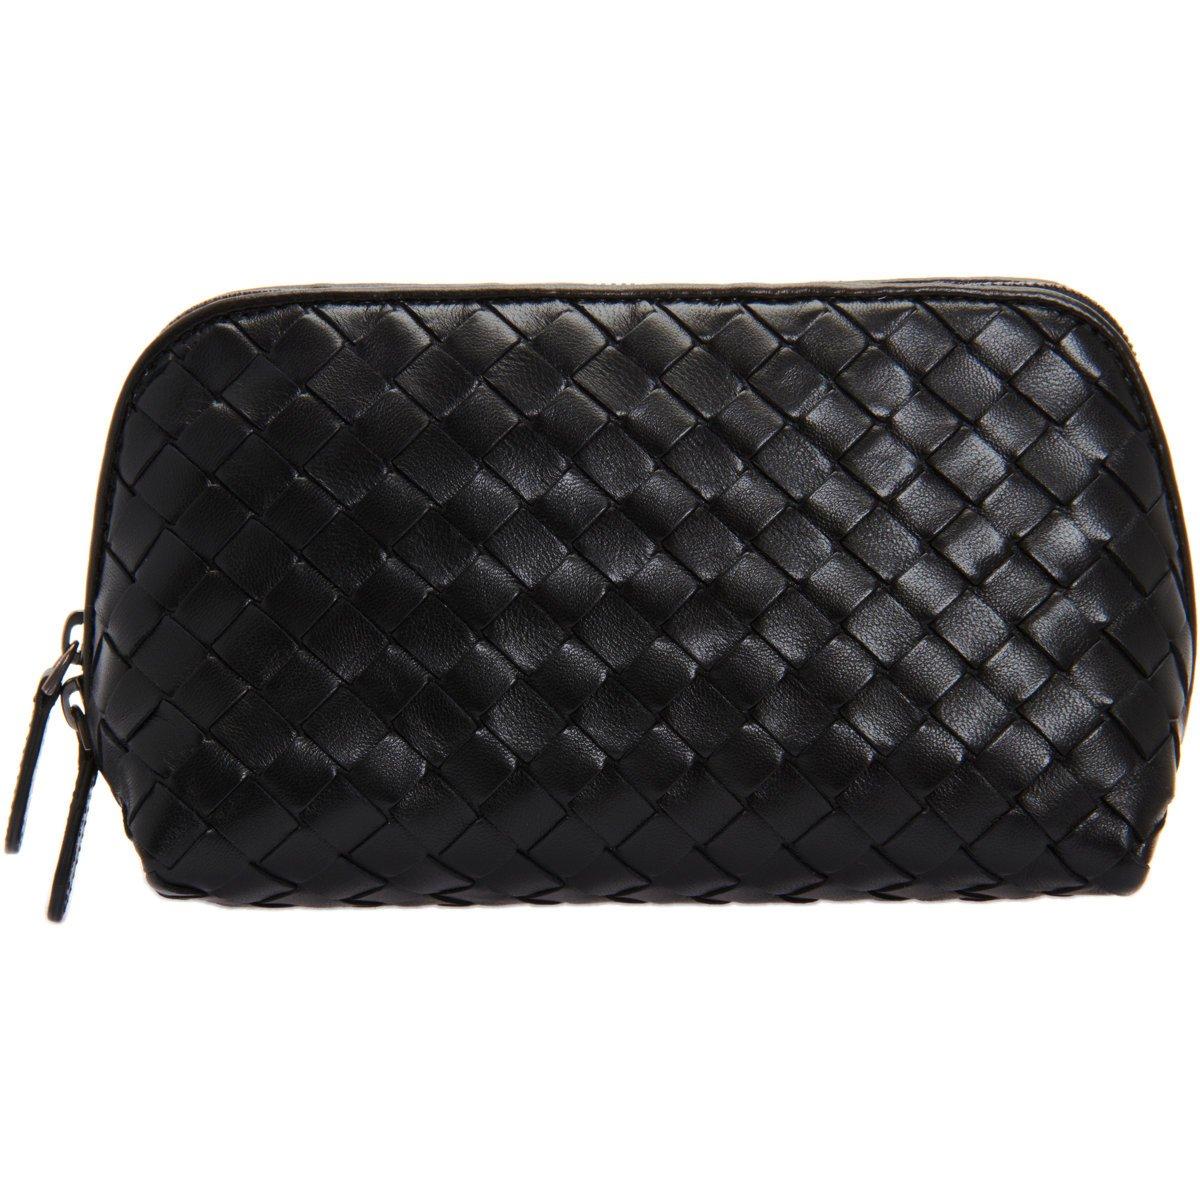 Bottega Veneta Medium Intrecciato Cosmetic Bag in Black - Lyst 7a0a170465edf